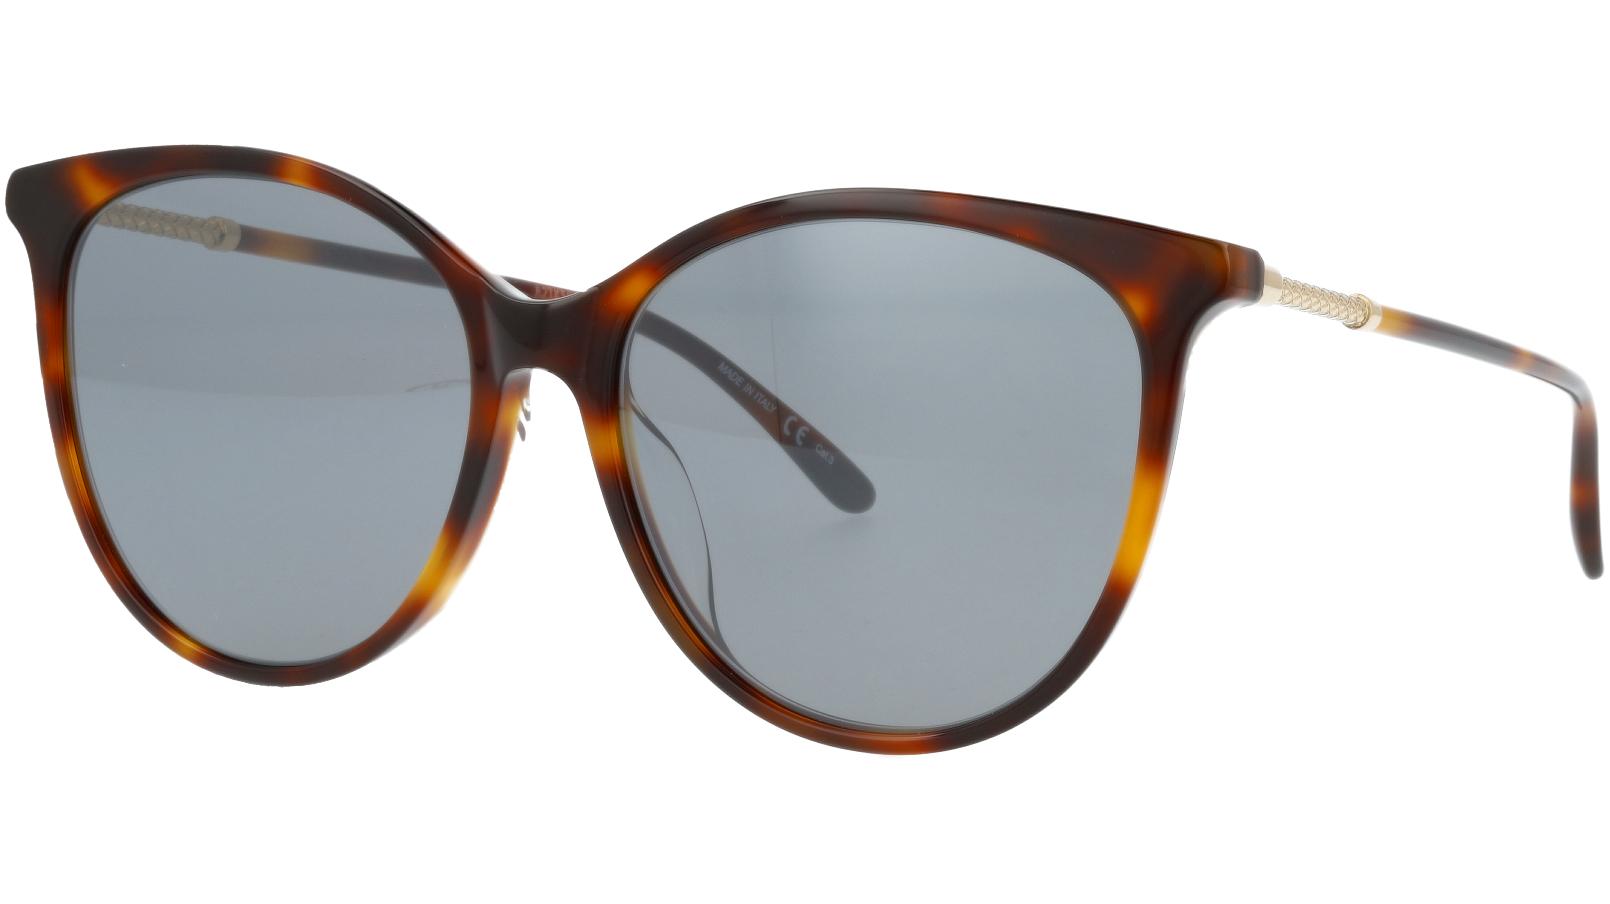 BOTTEGA VENETA BV0154SK 003 57 AVANA Sunglasses